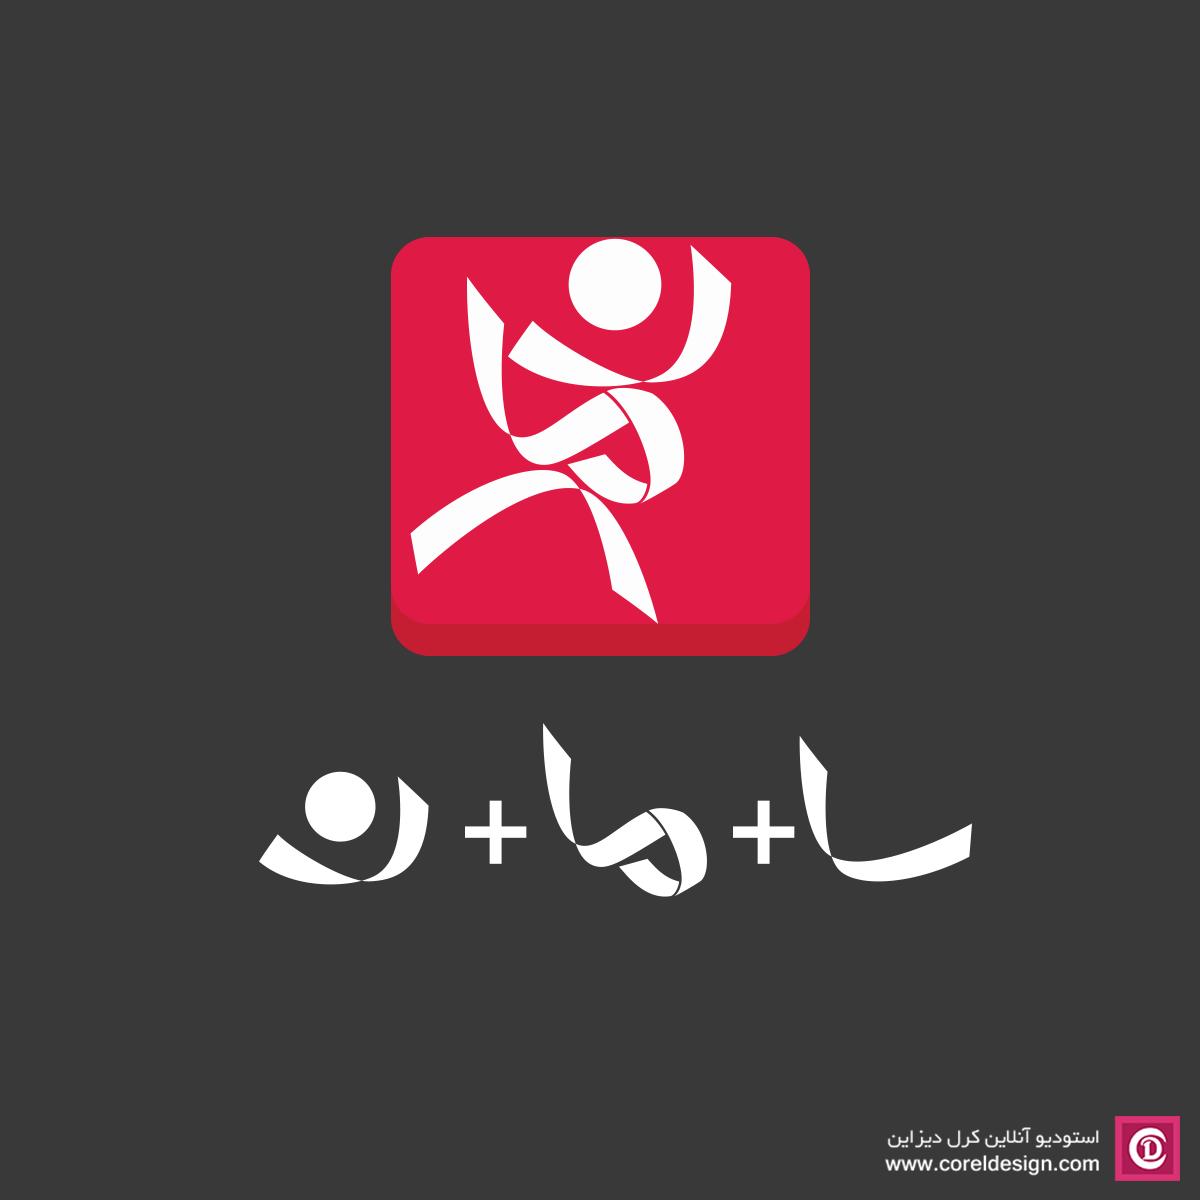 Saman_logo_By_CorelDesign_3